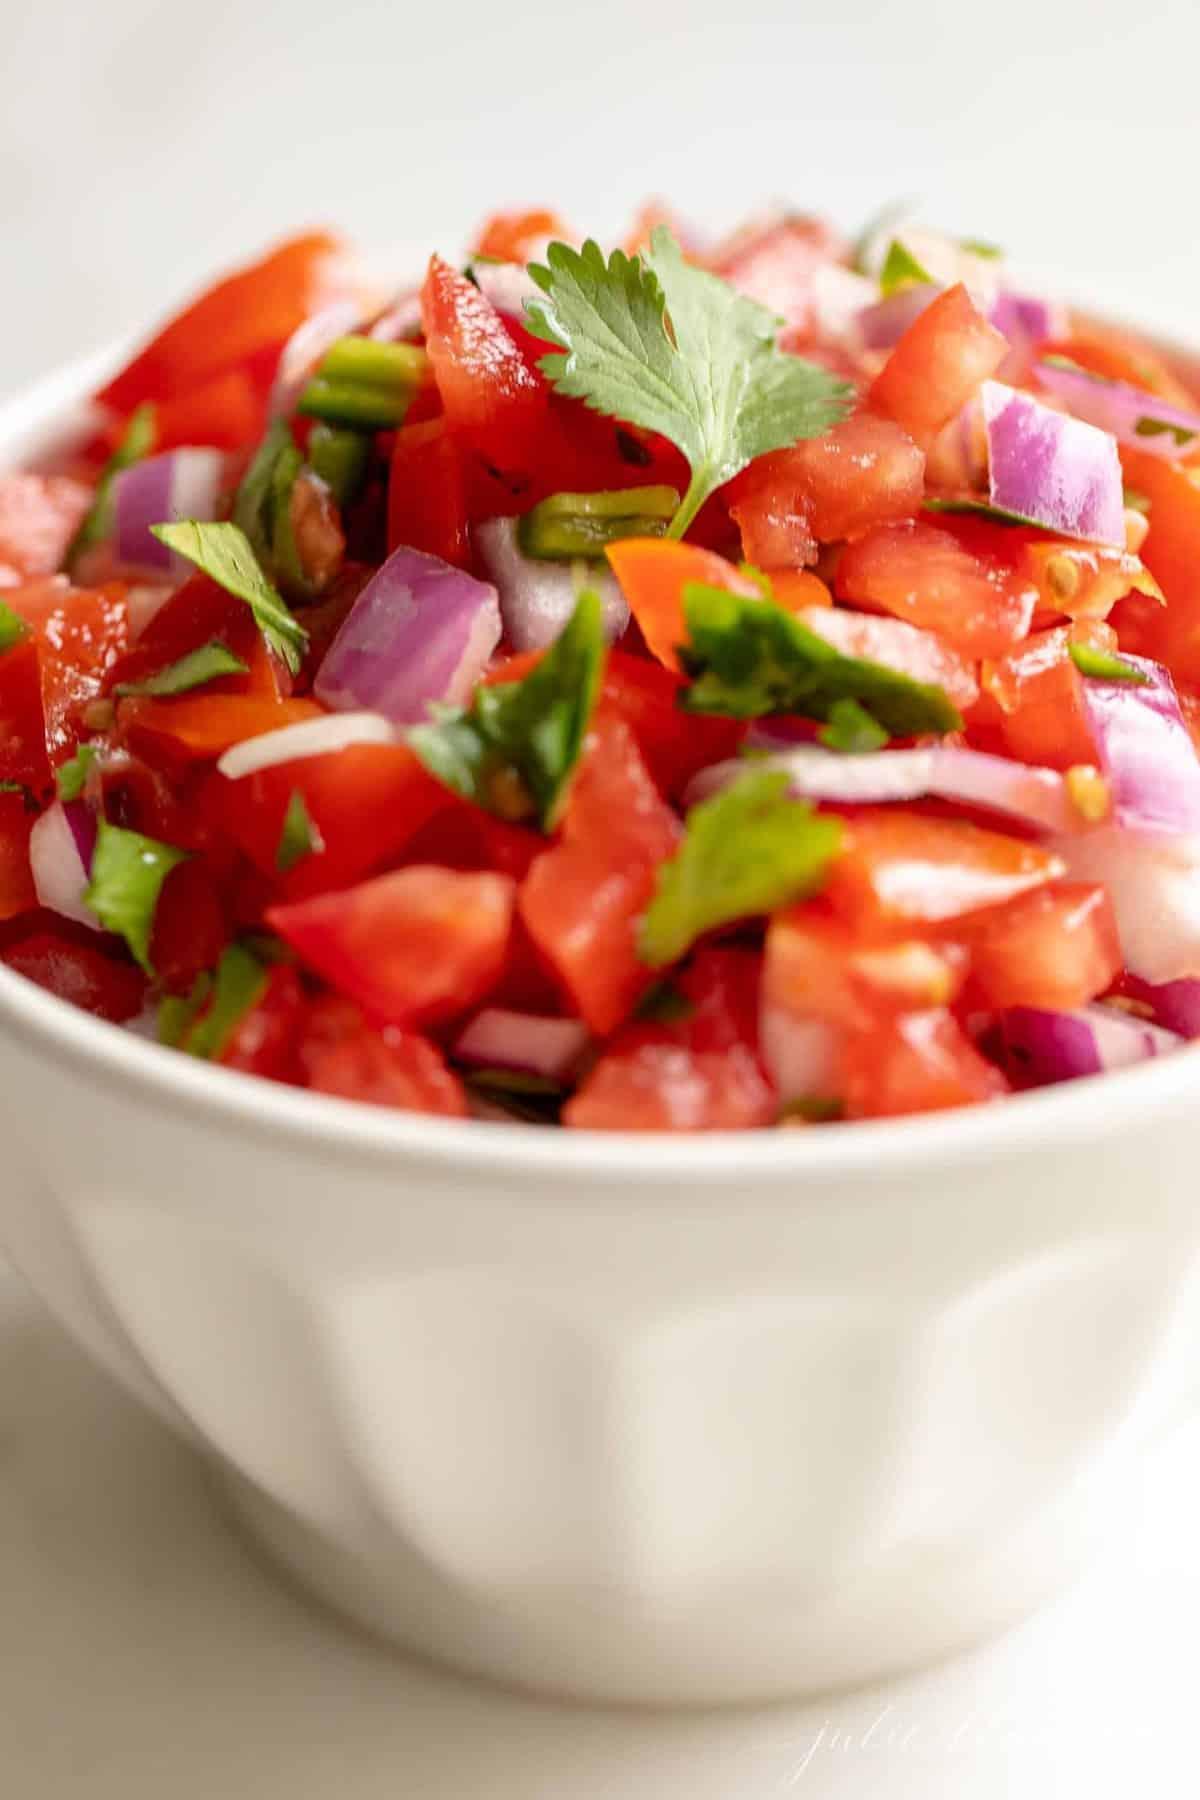 A white bowl filled with fresh pico de gallo.